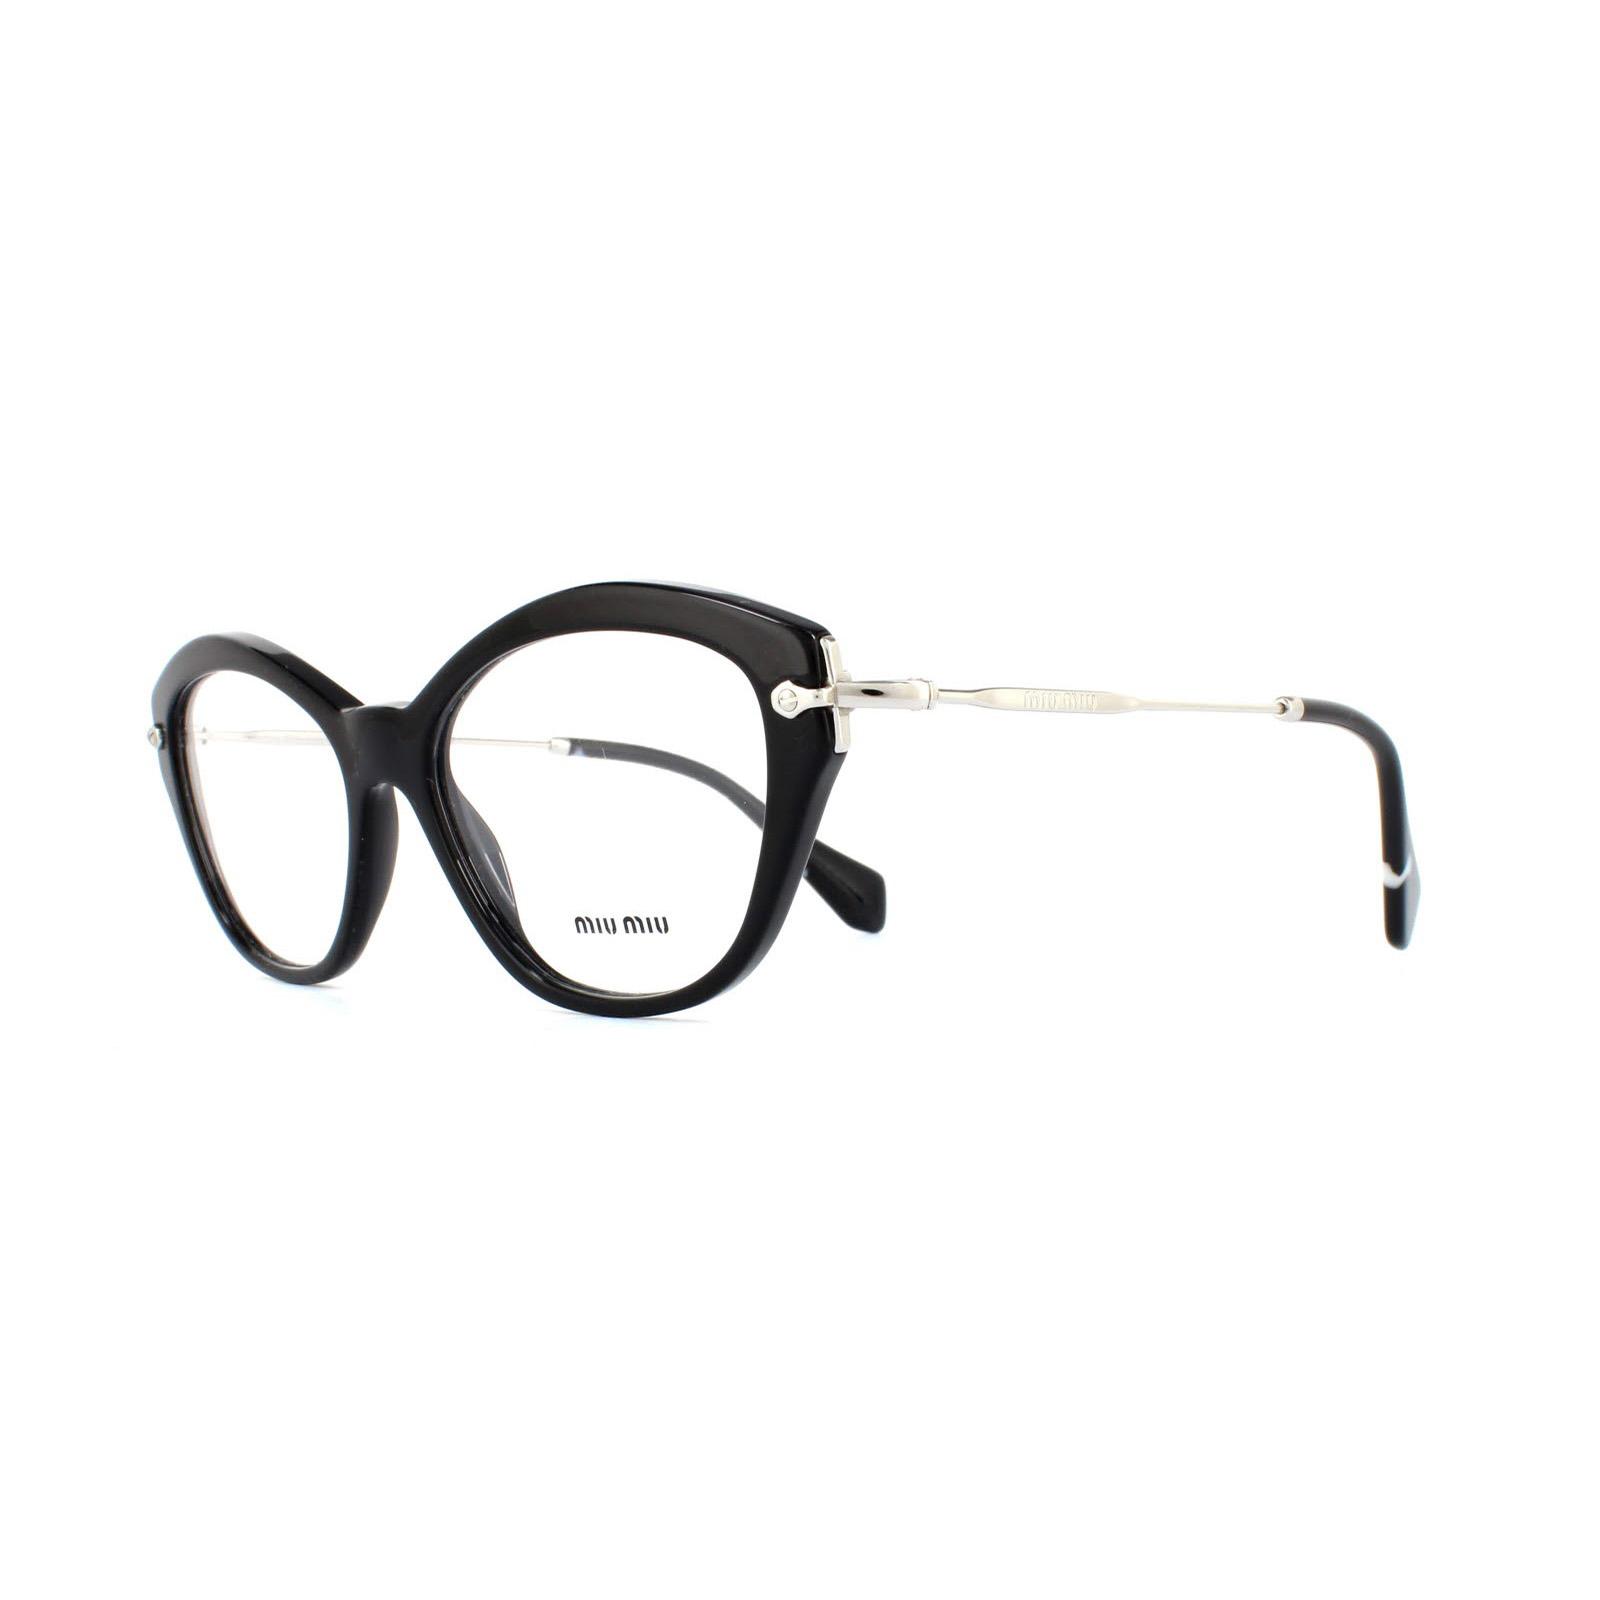 be68e60857 Sentinel Miu Miu Glasses Frames 02OV 1AB1O1 Black Womens 54mm